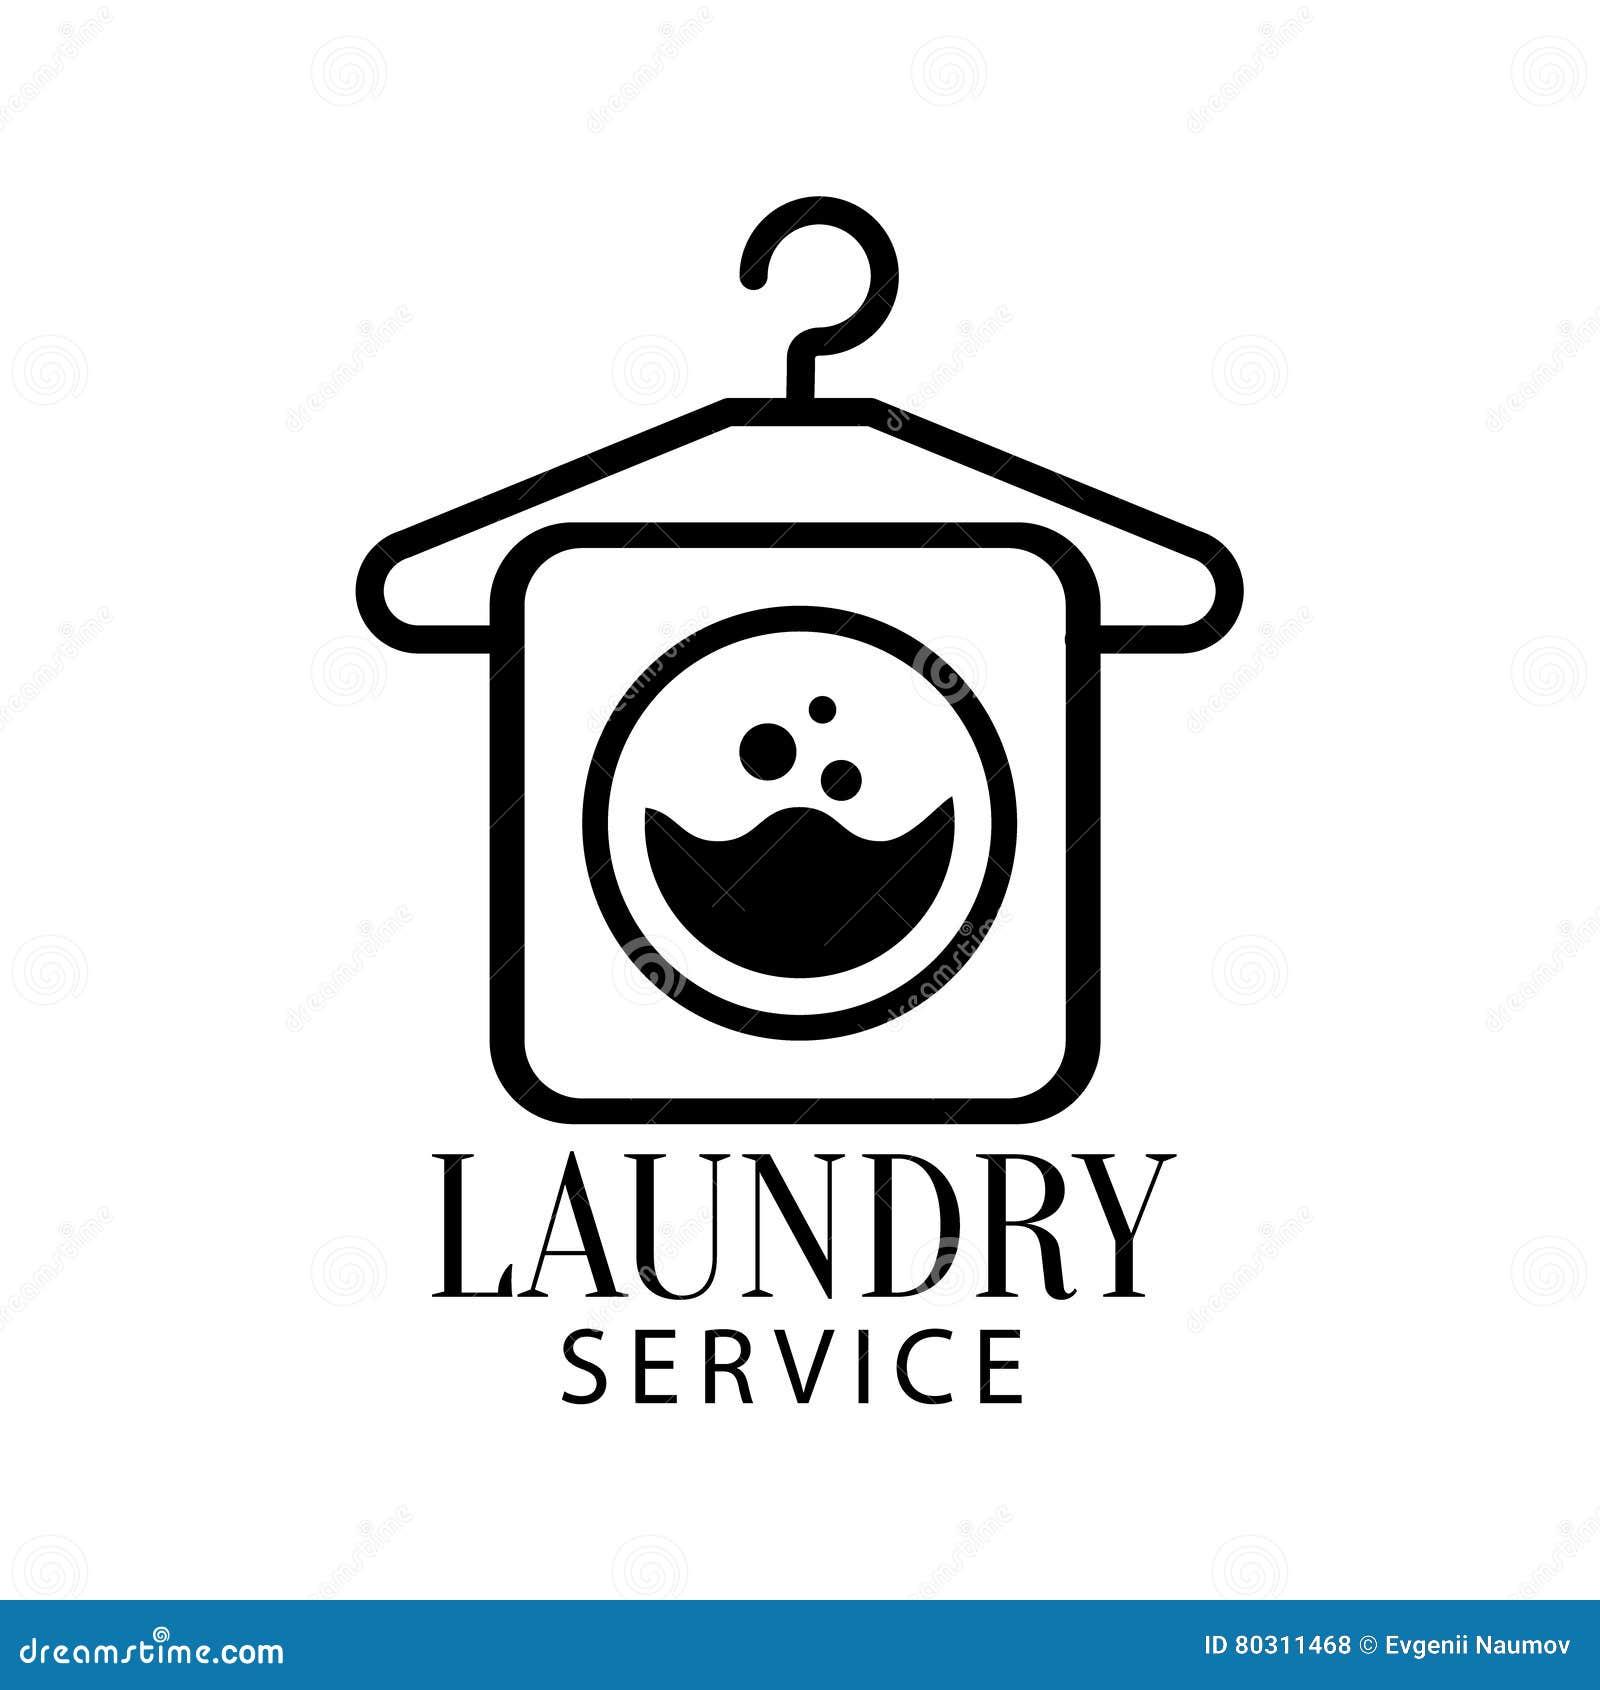 laundry machine service